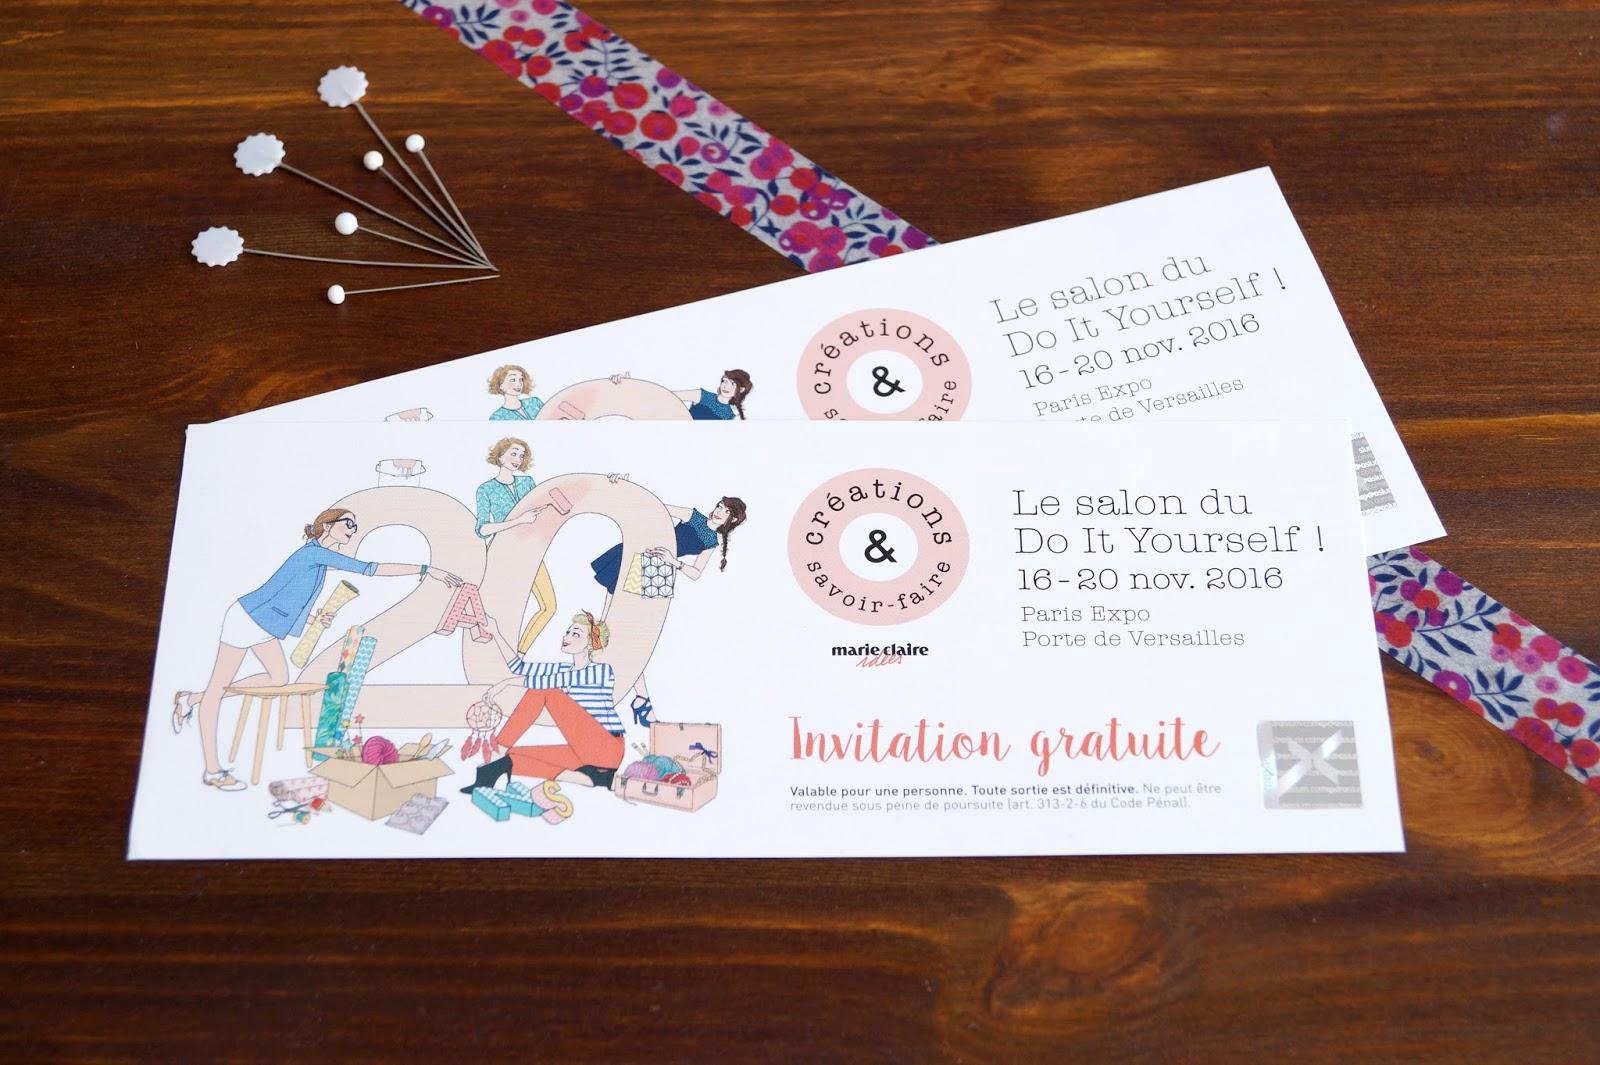 Christelle beneytout le blog cr ations savoir faire - Salon creations savoir faire invitation ...